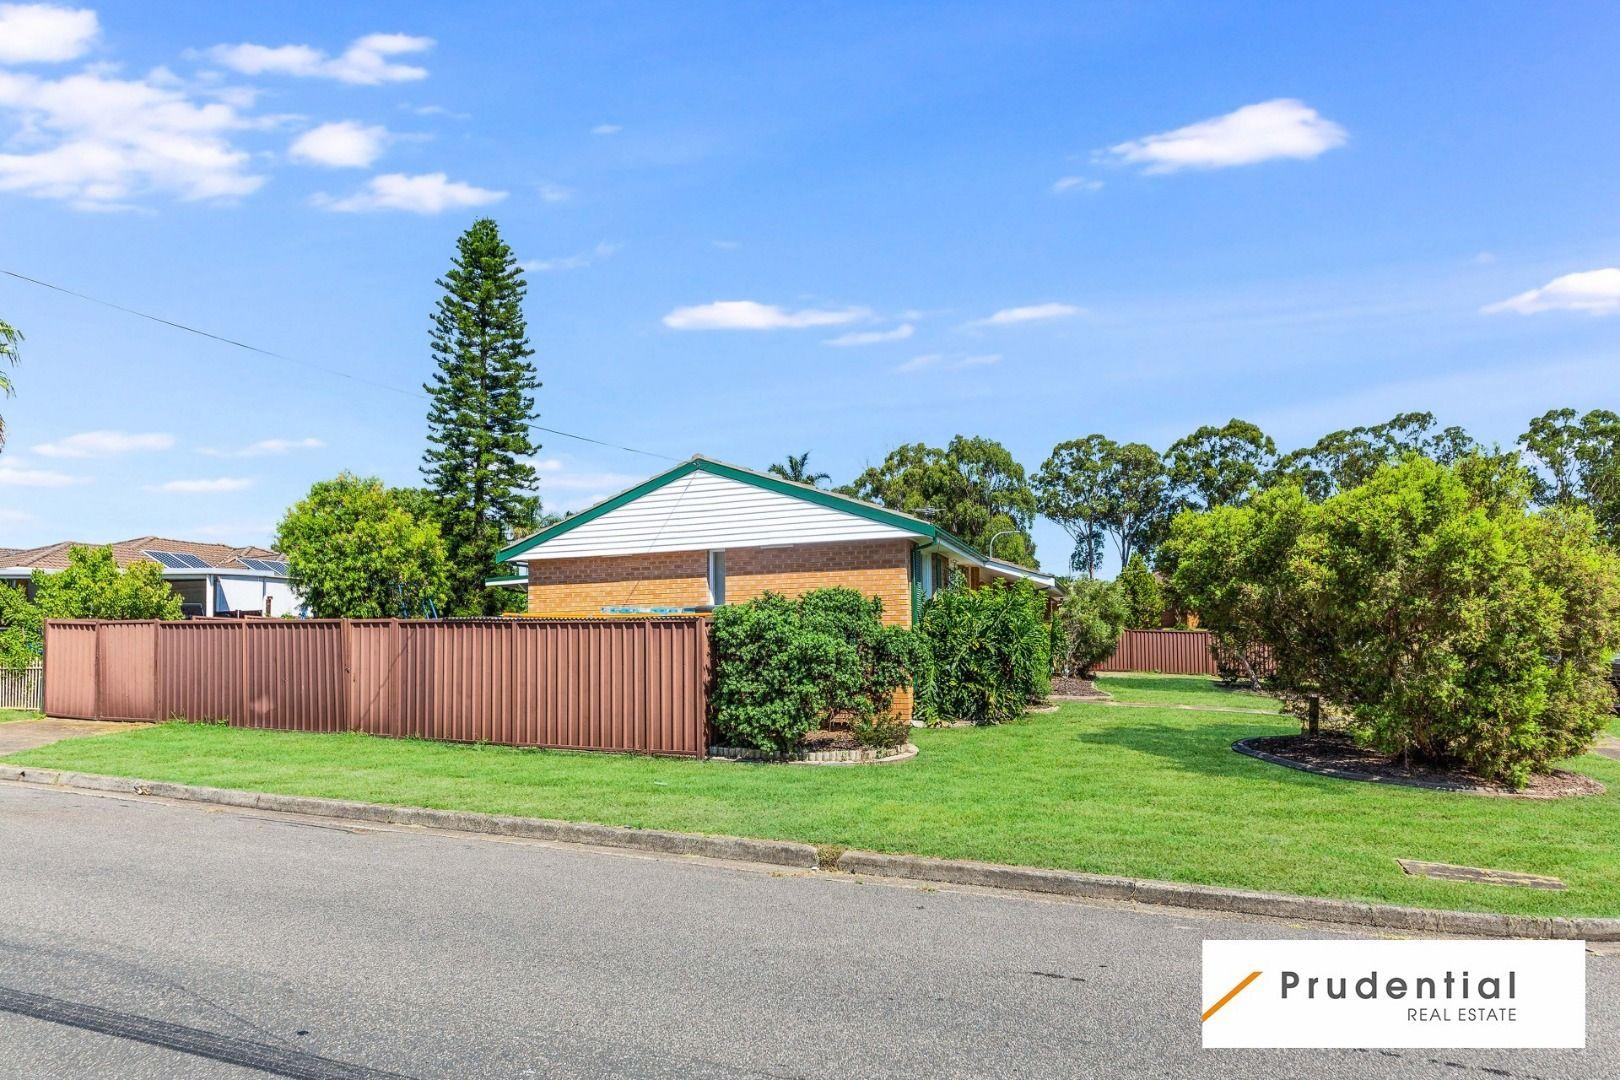 1 Darling Ave, Lurnea NSW 2170, Image 1